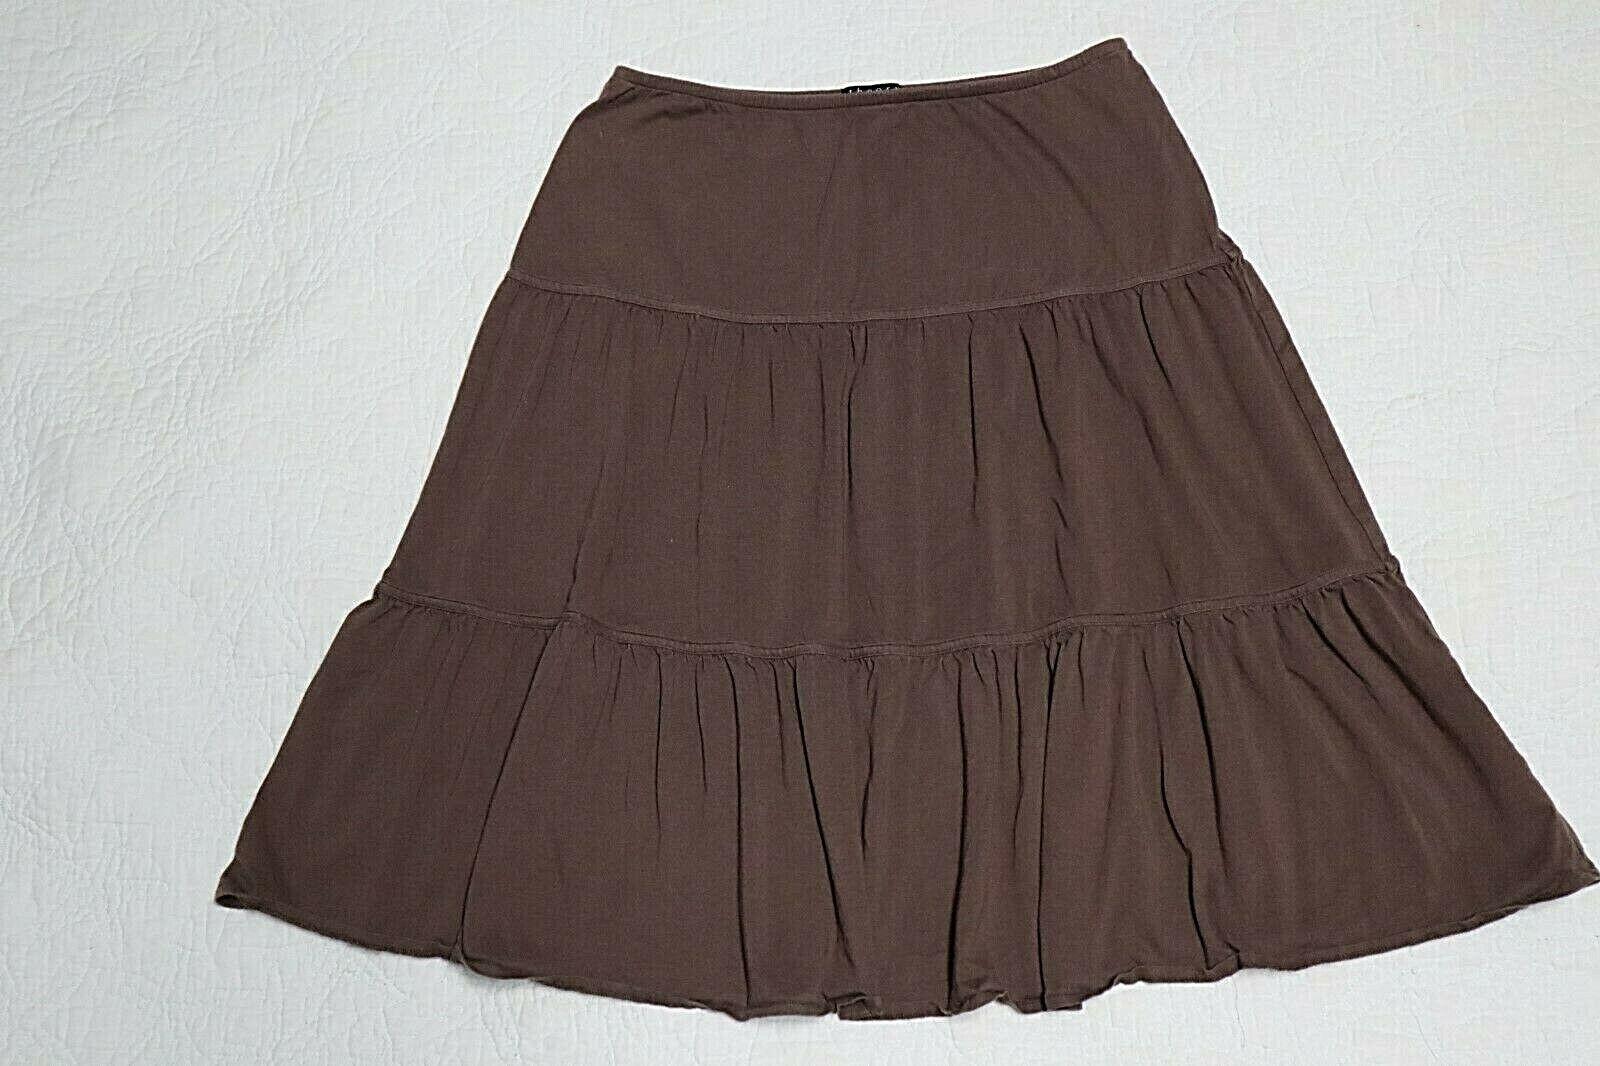 THEORY braun Stretch Skirt  Größe P (26W x 22 3 4L) PERU